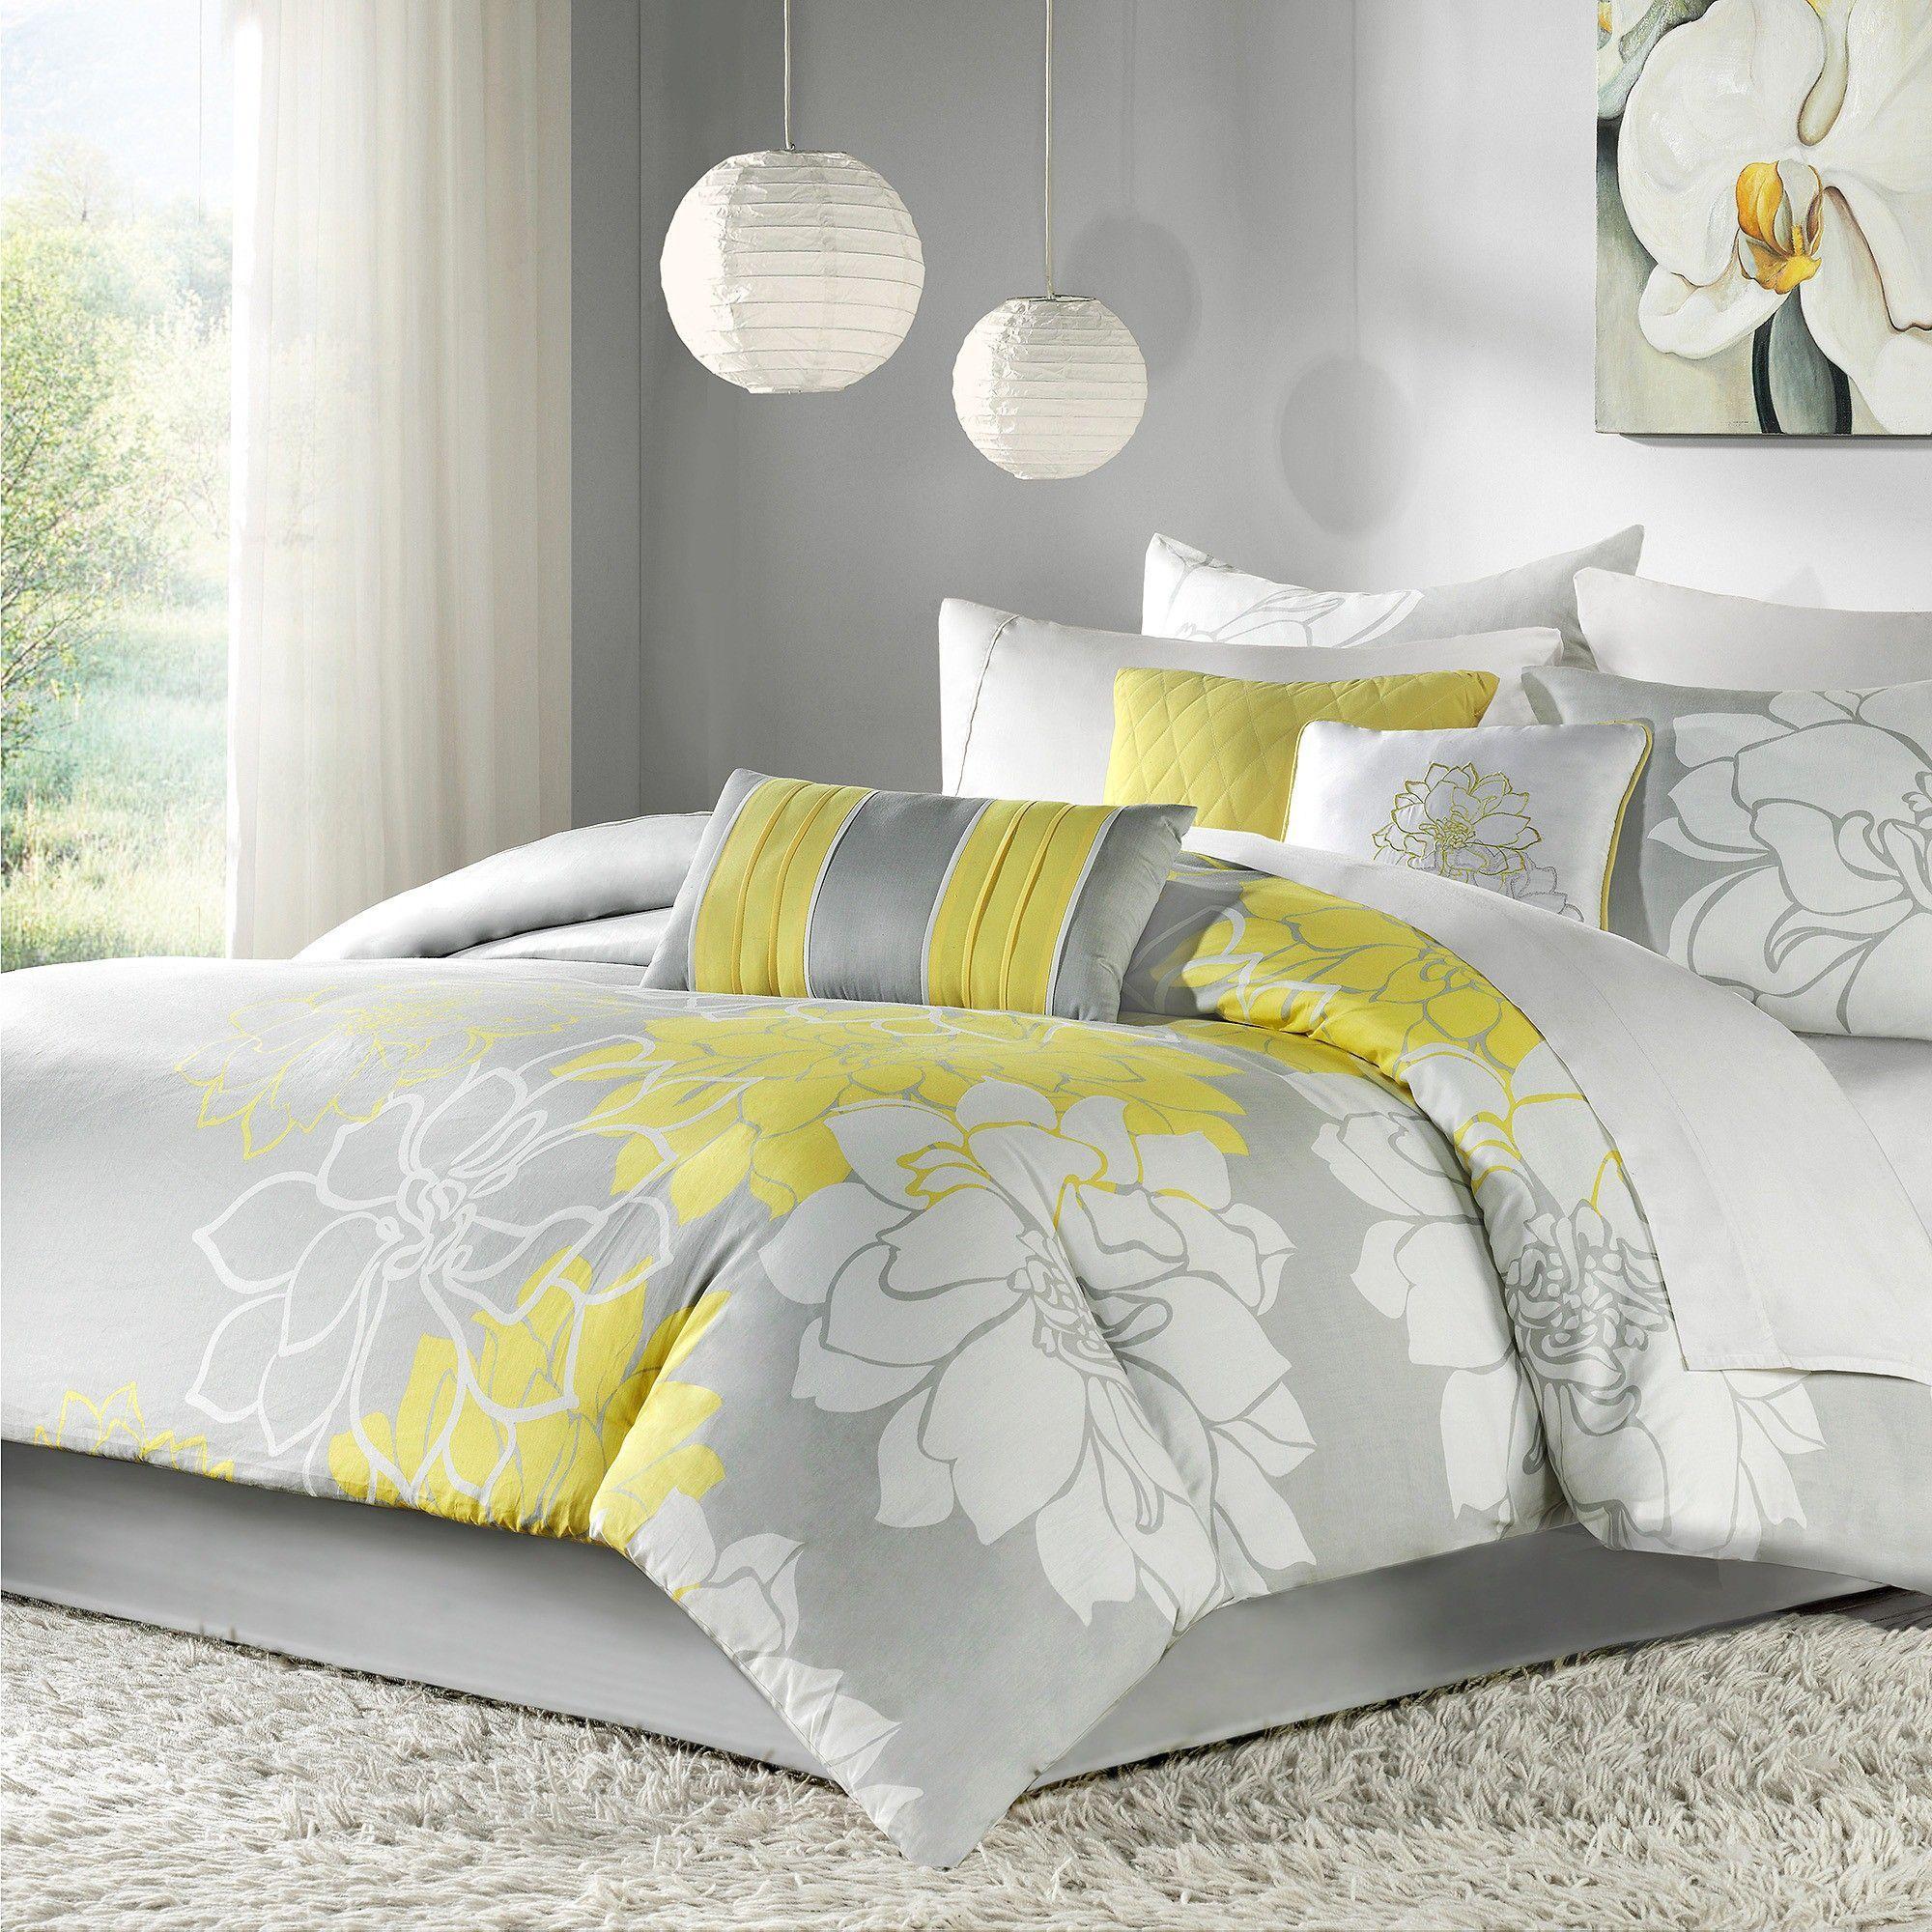 Brianna 7 Piece Print Comforter Set Gray Yellow California King